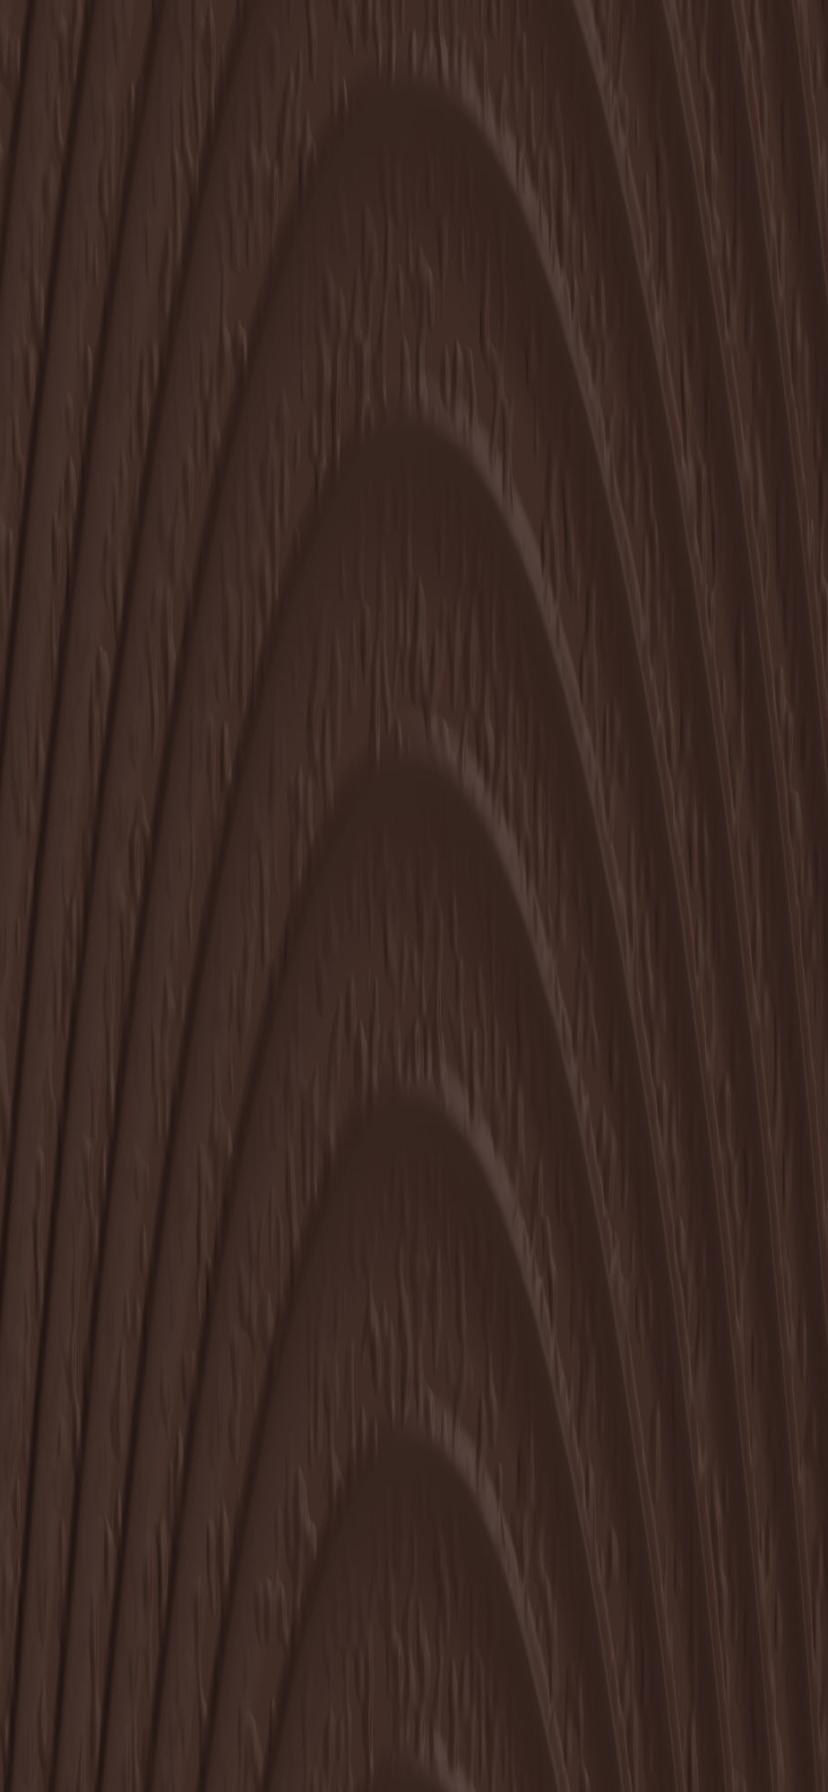 Wallpaper 852223